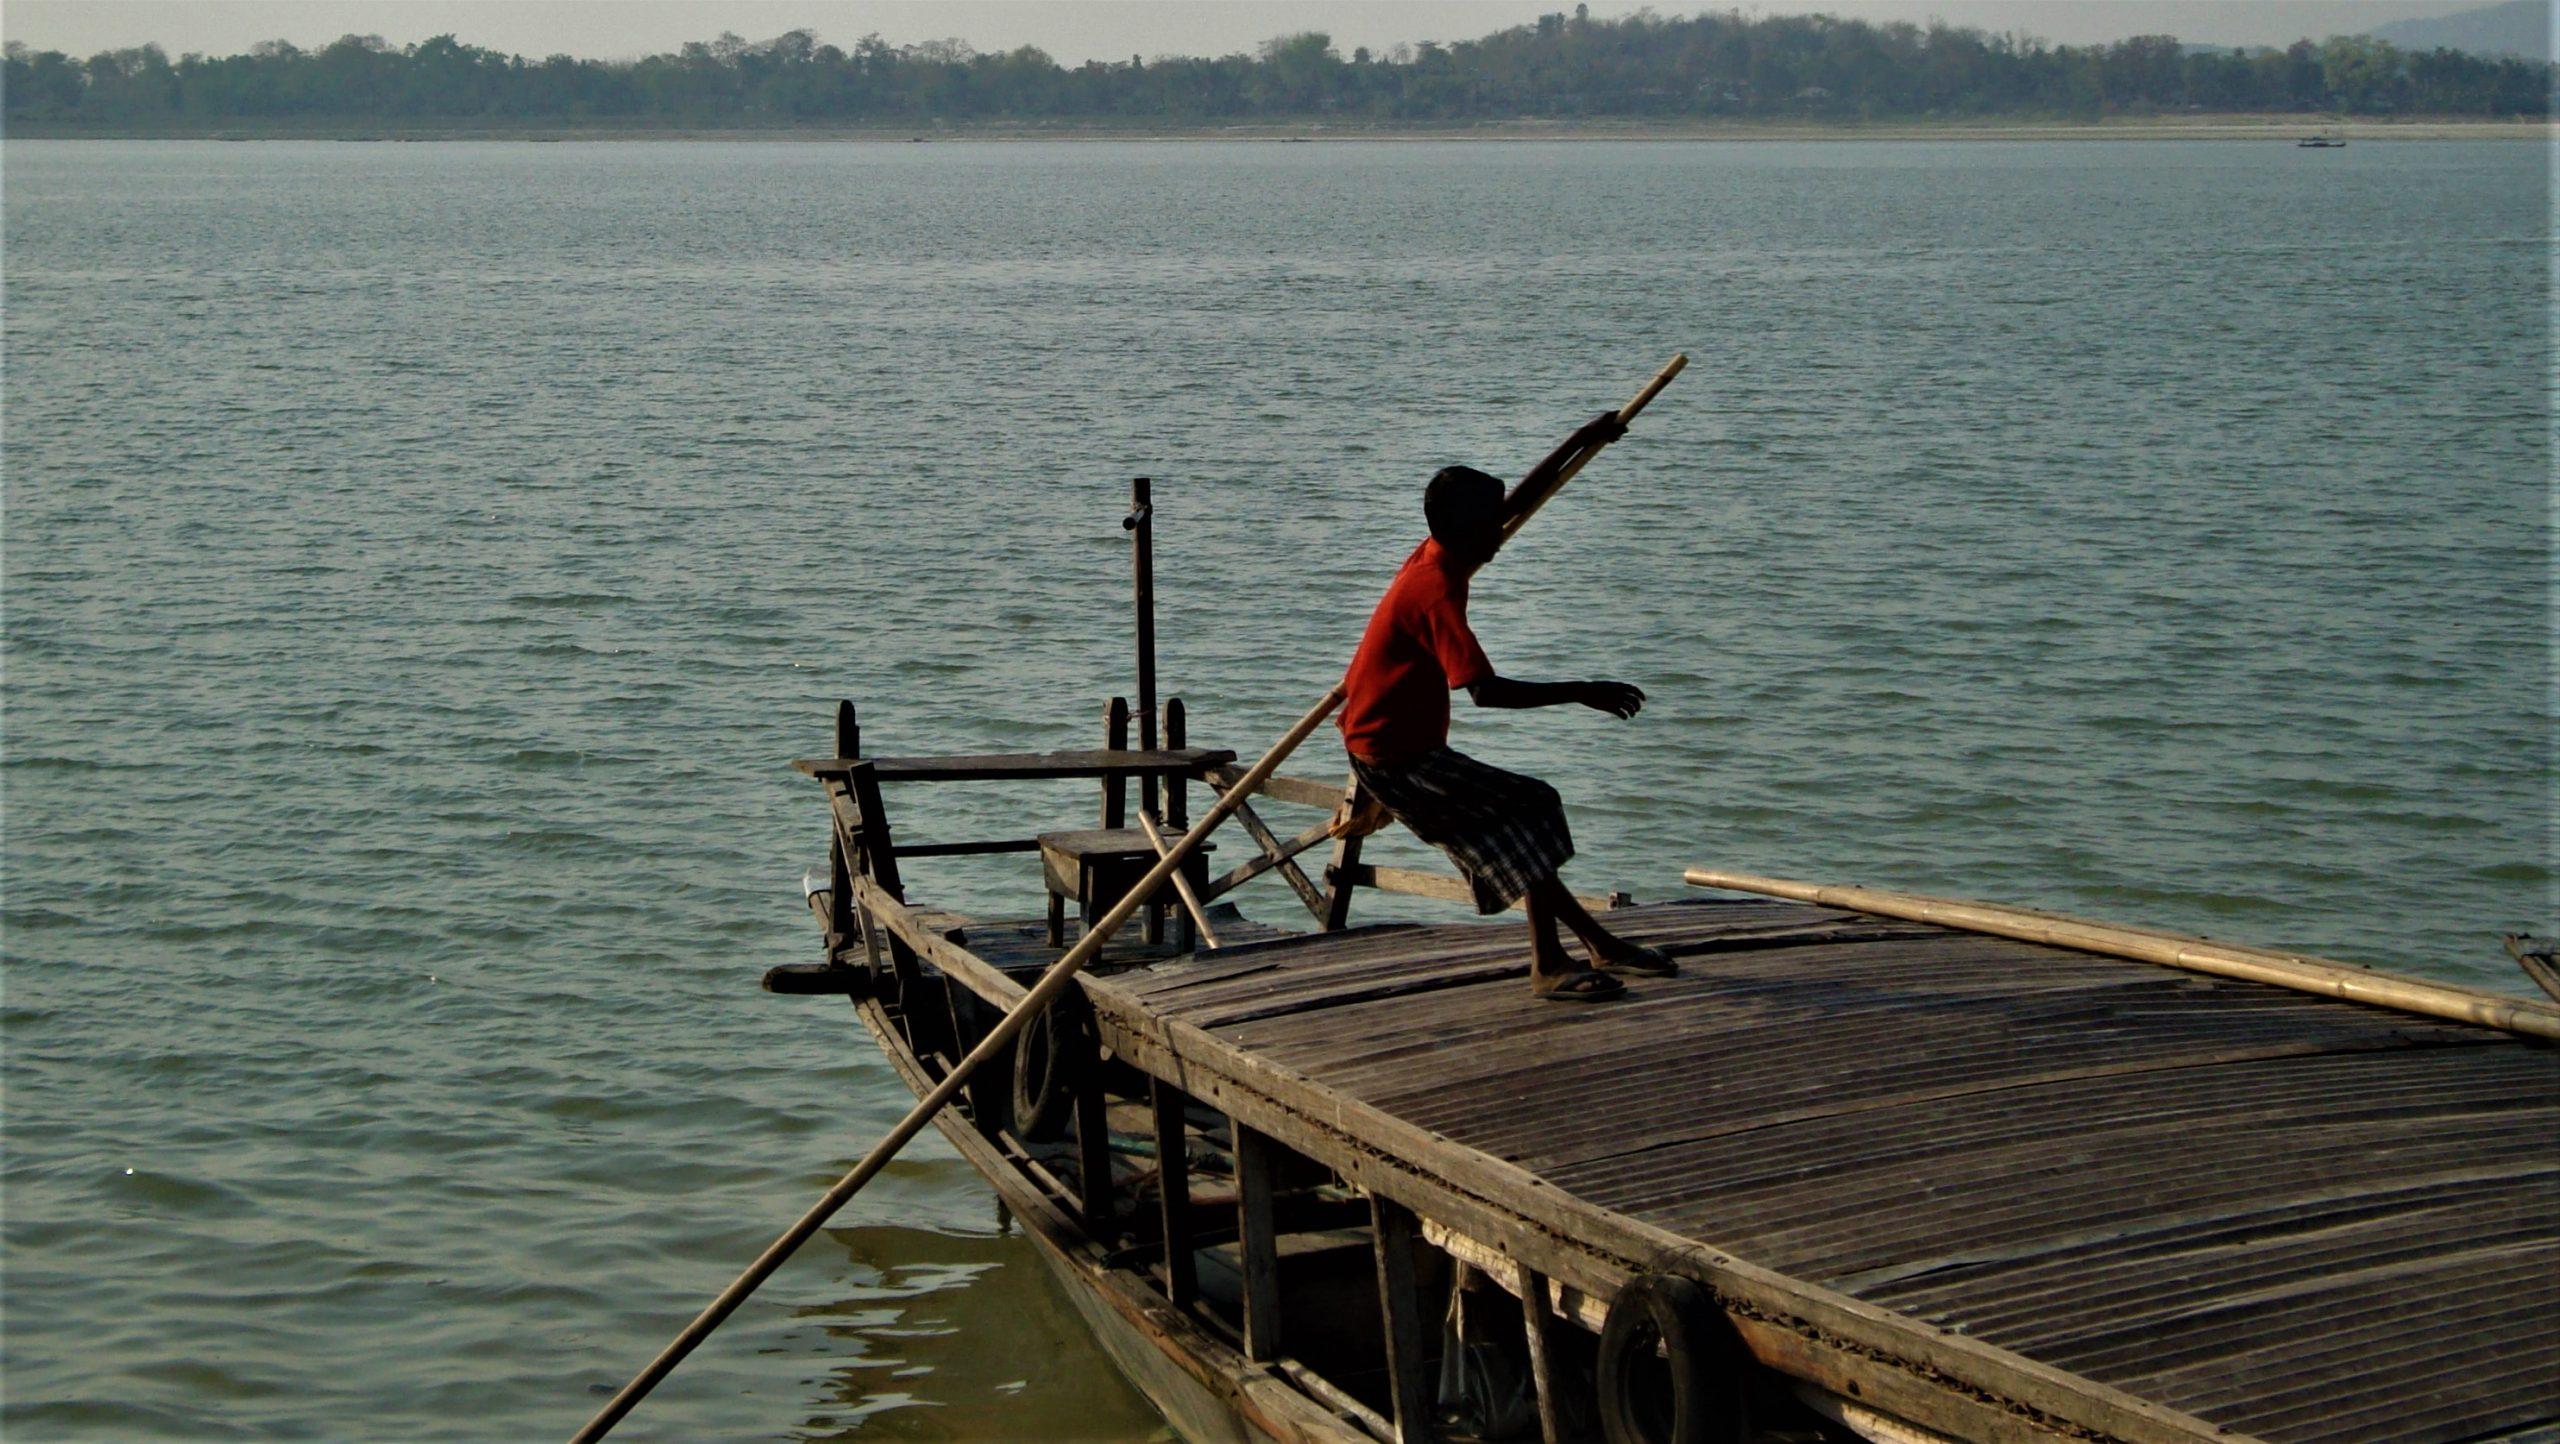 Ferry Ride at Brahmaputra River, Guwahati